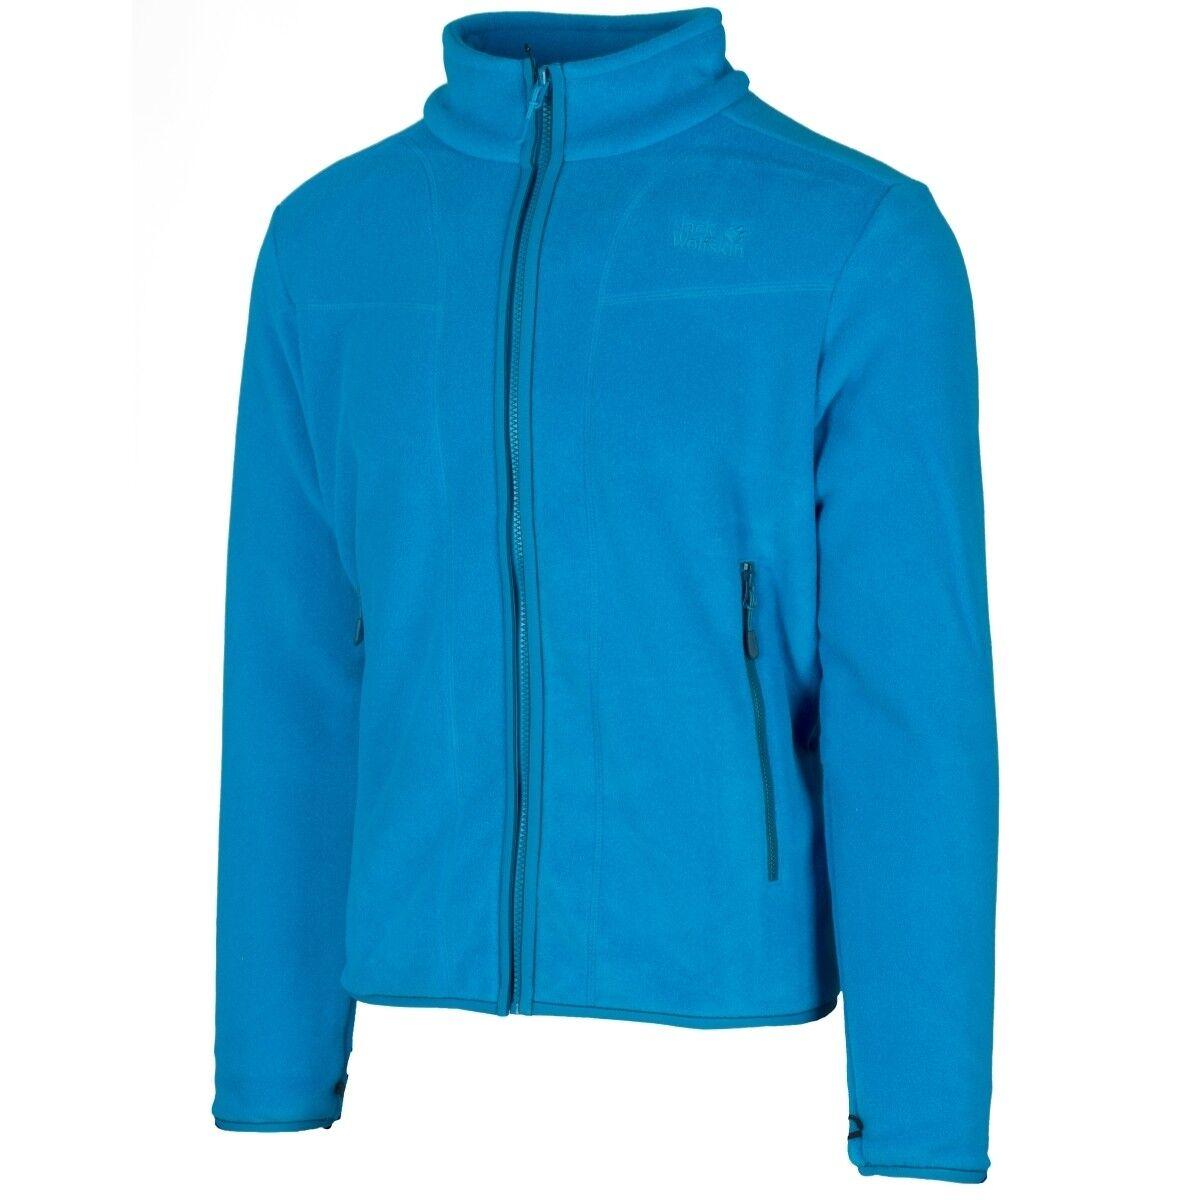 Jack Wolfskin Moonshine track Men Jacket outdoor Fleece chaqueta azul 1706951-1062